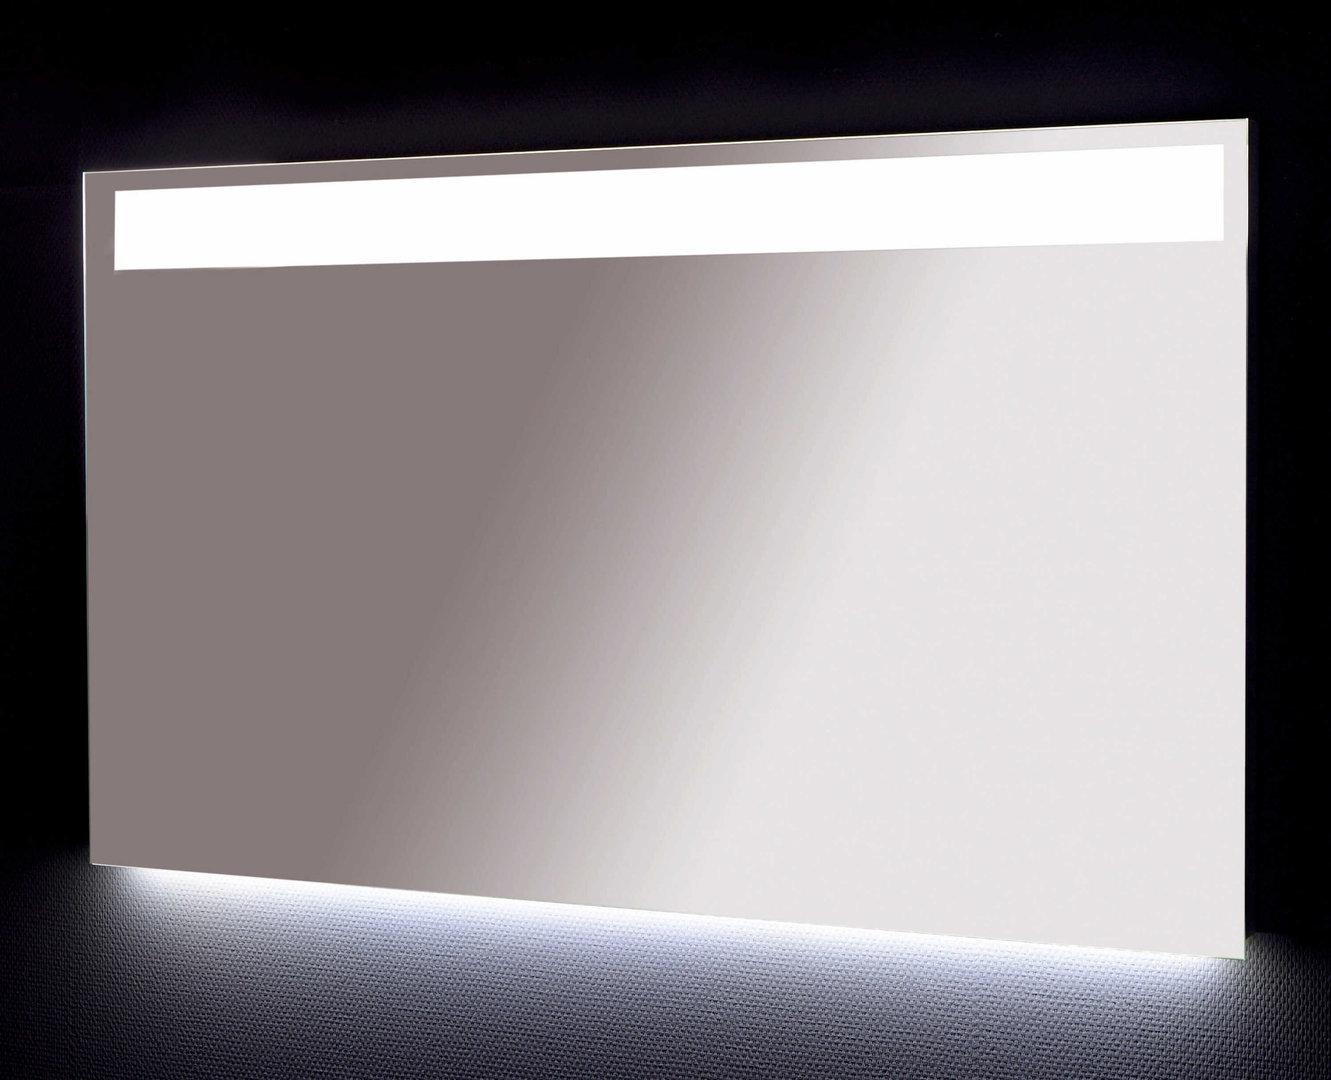 thebalux spirit led spiegel heizung 3 lichtstufen 60x75cm nano. Black Bedroom Furniture Sets. Home Design Ideas